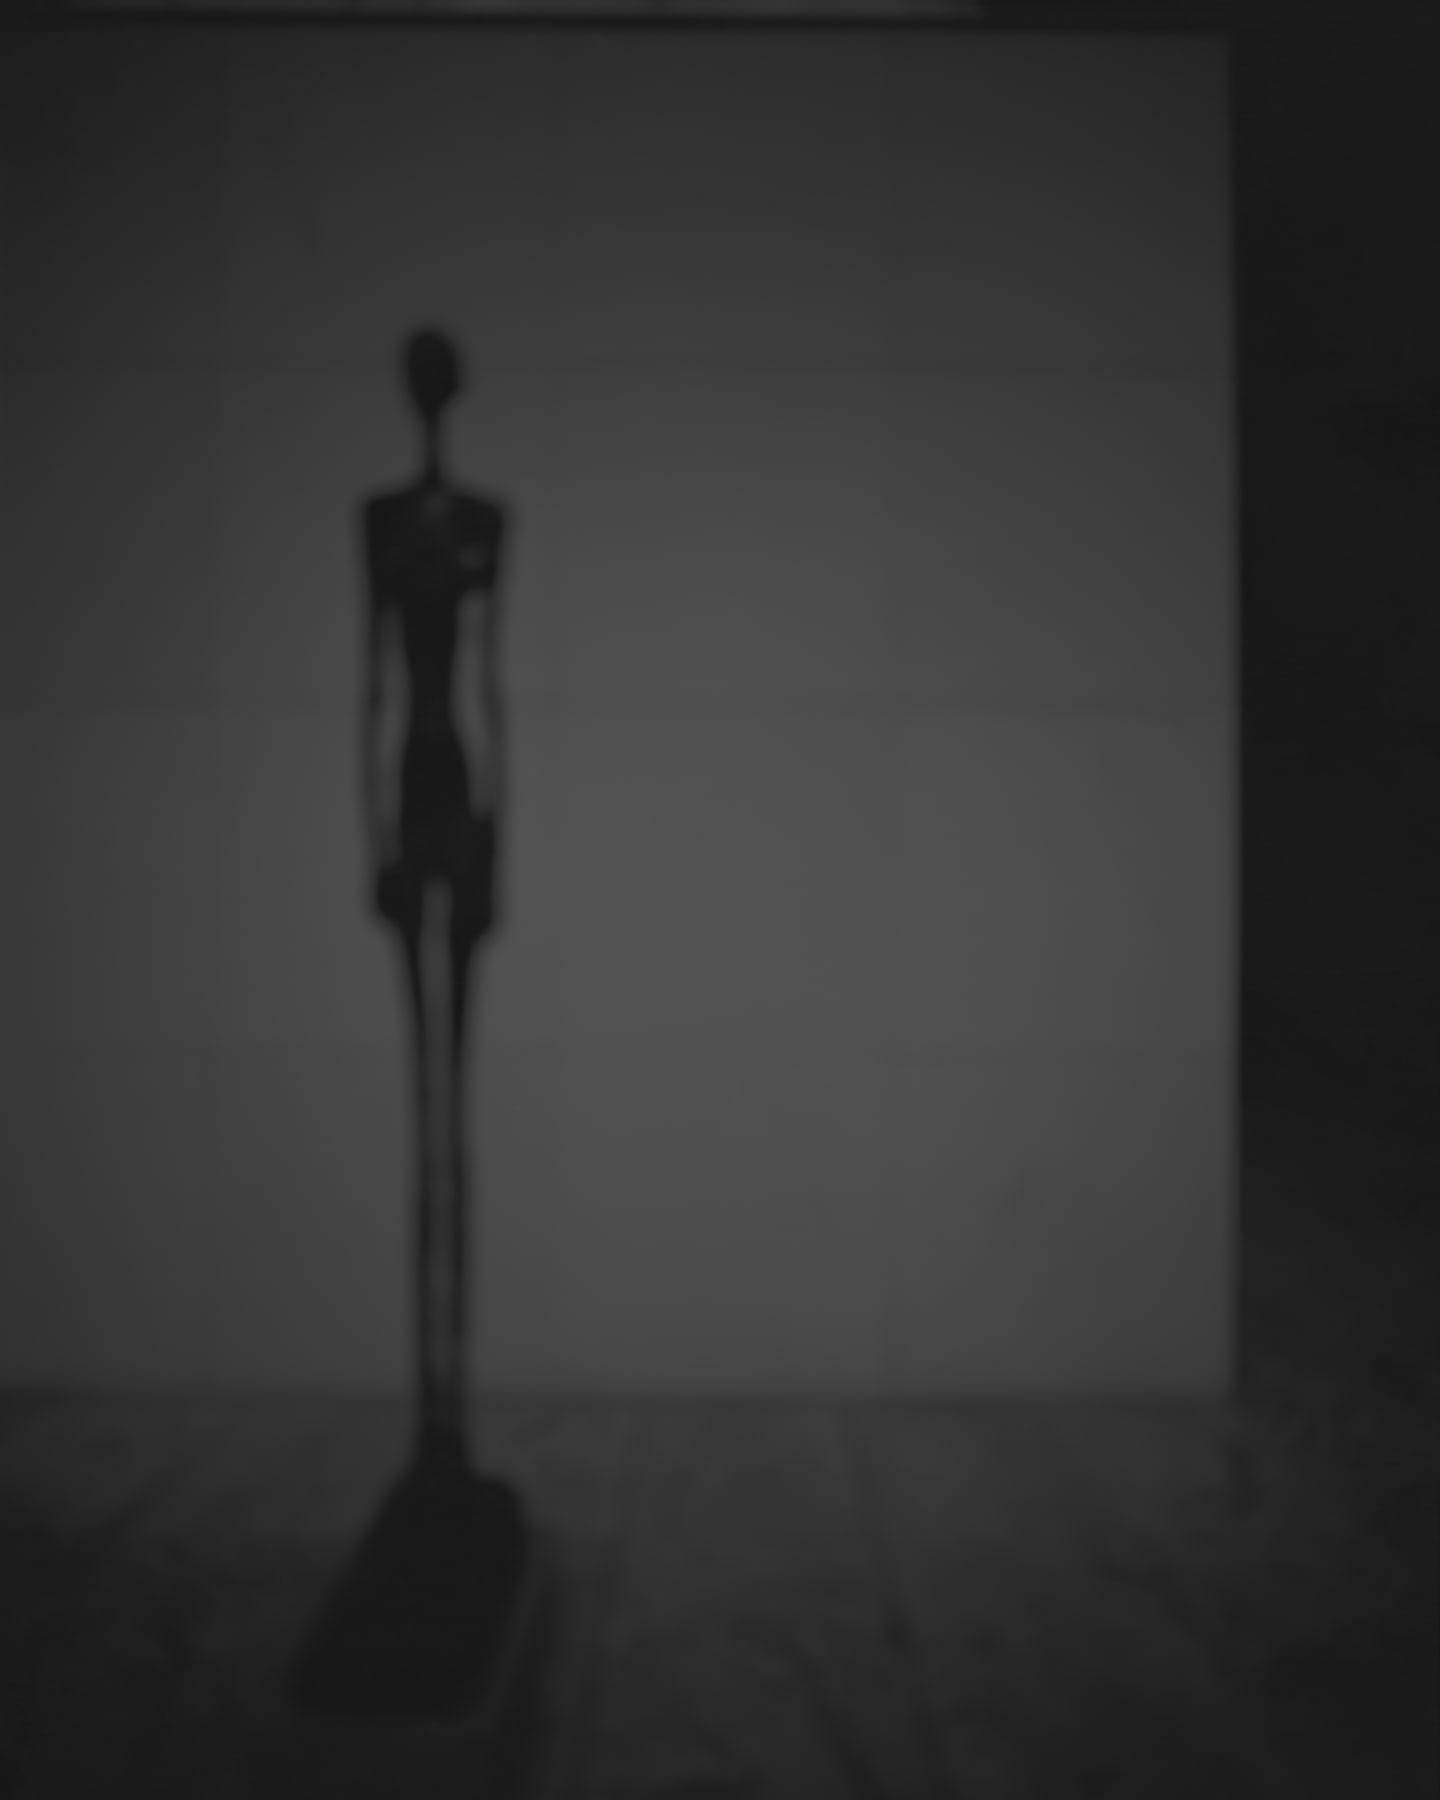 Hiroshi Sugimoto, Past Presence 001, Tall Figure III, Alberto Giacometti, 2013